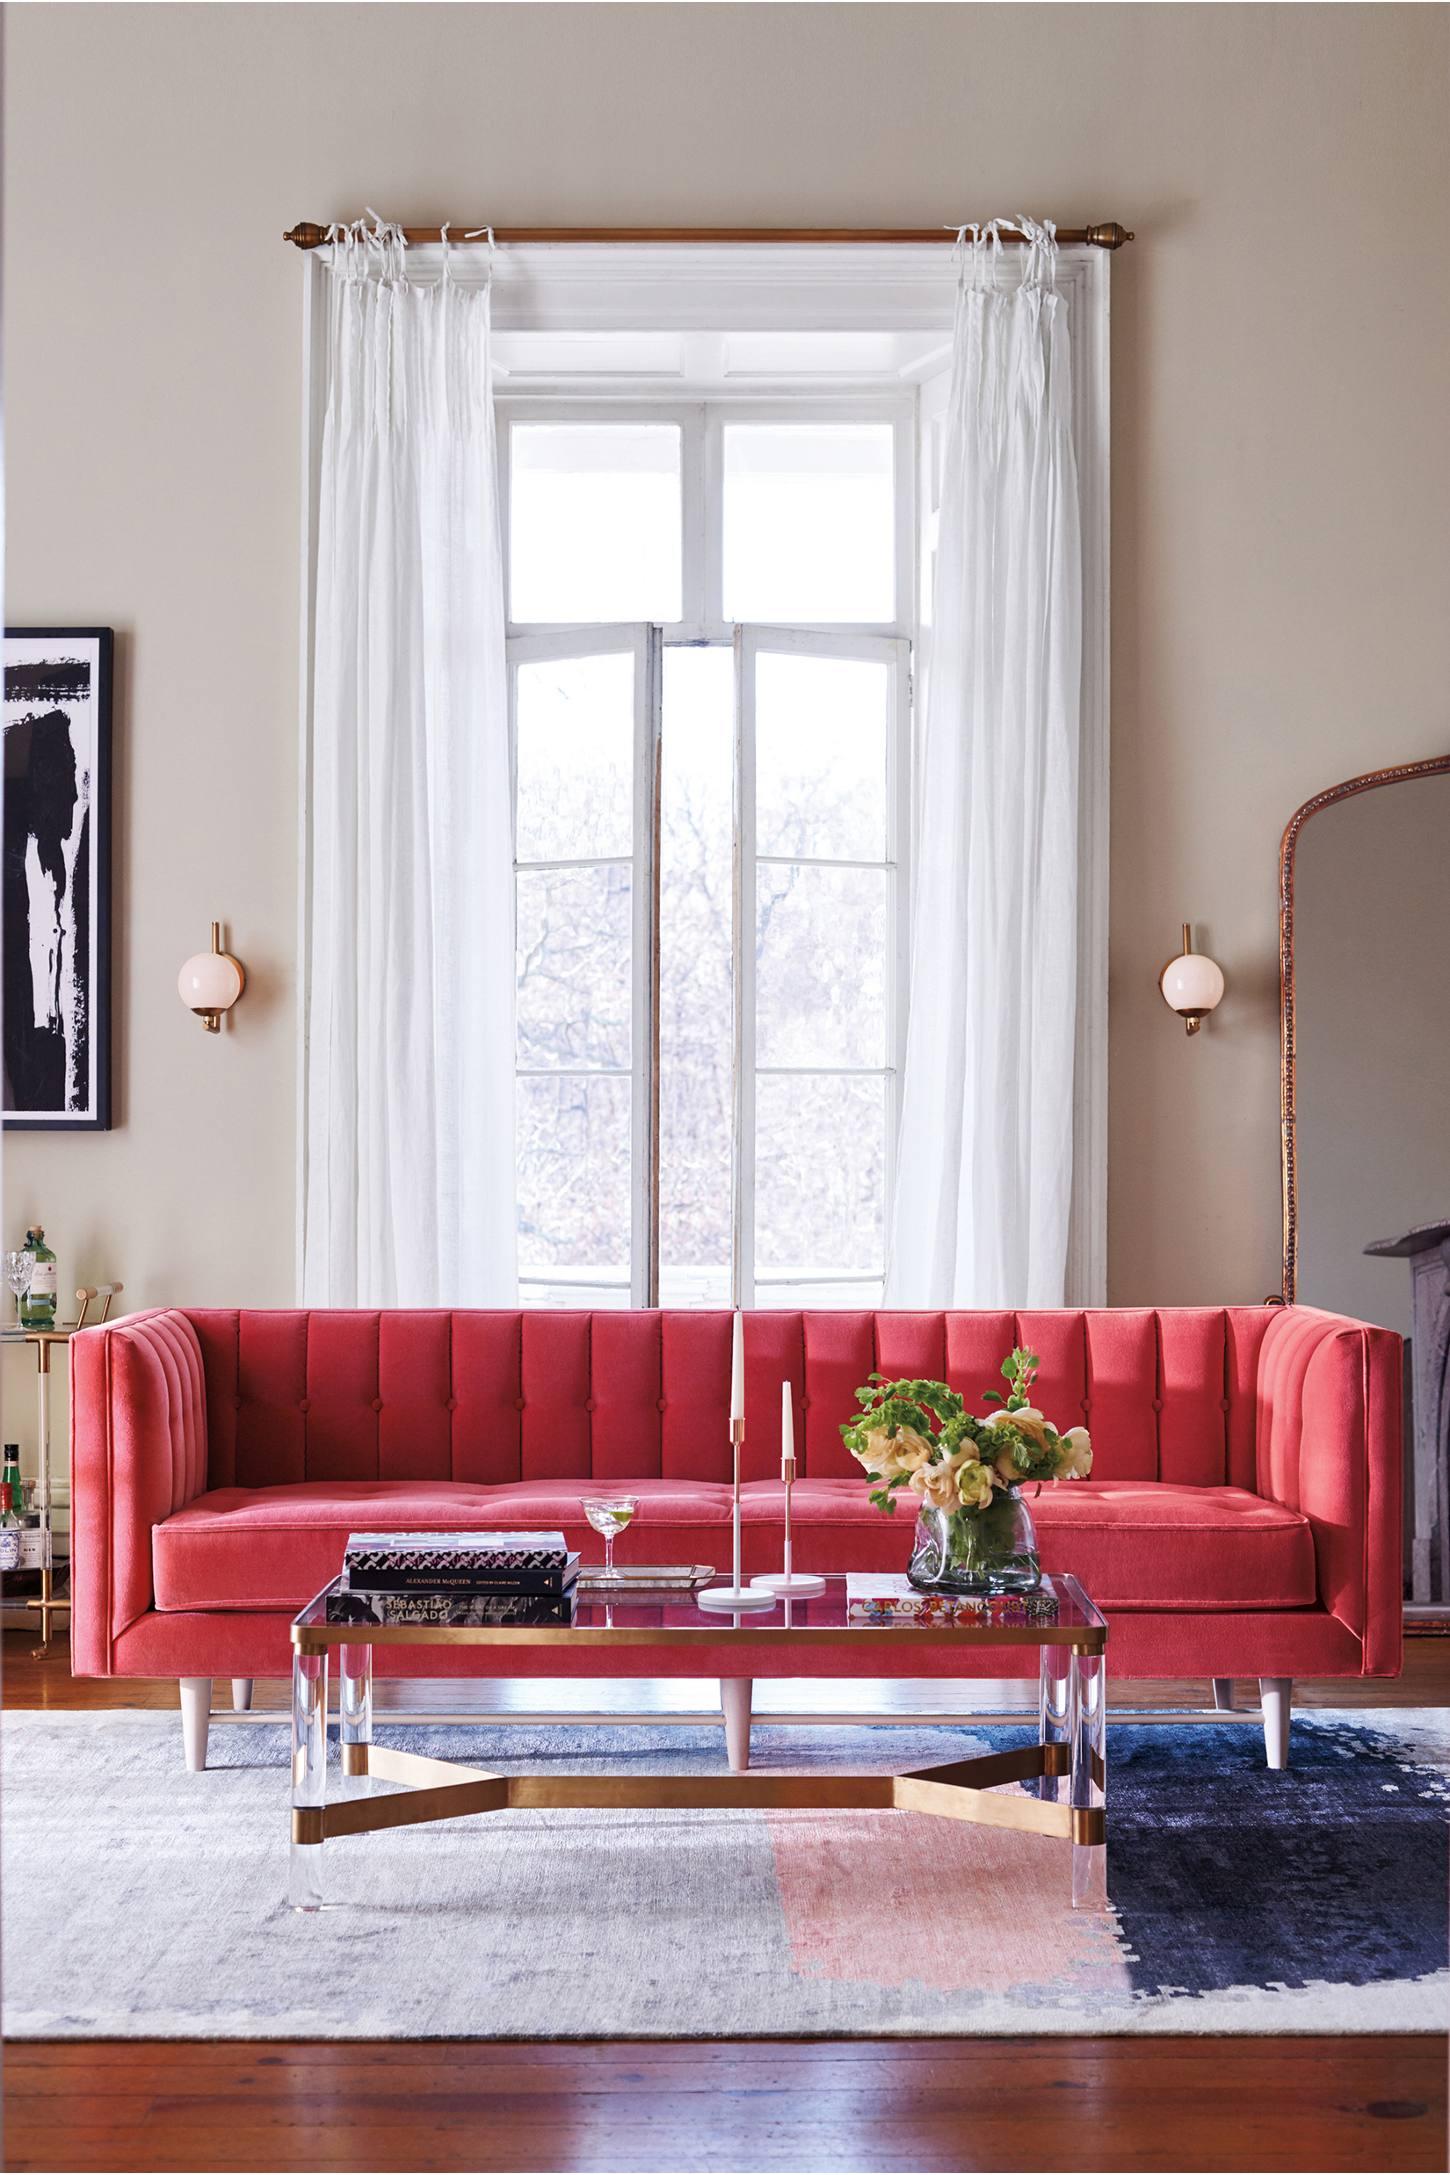 Essential Features when Choosing a Sofa